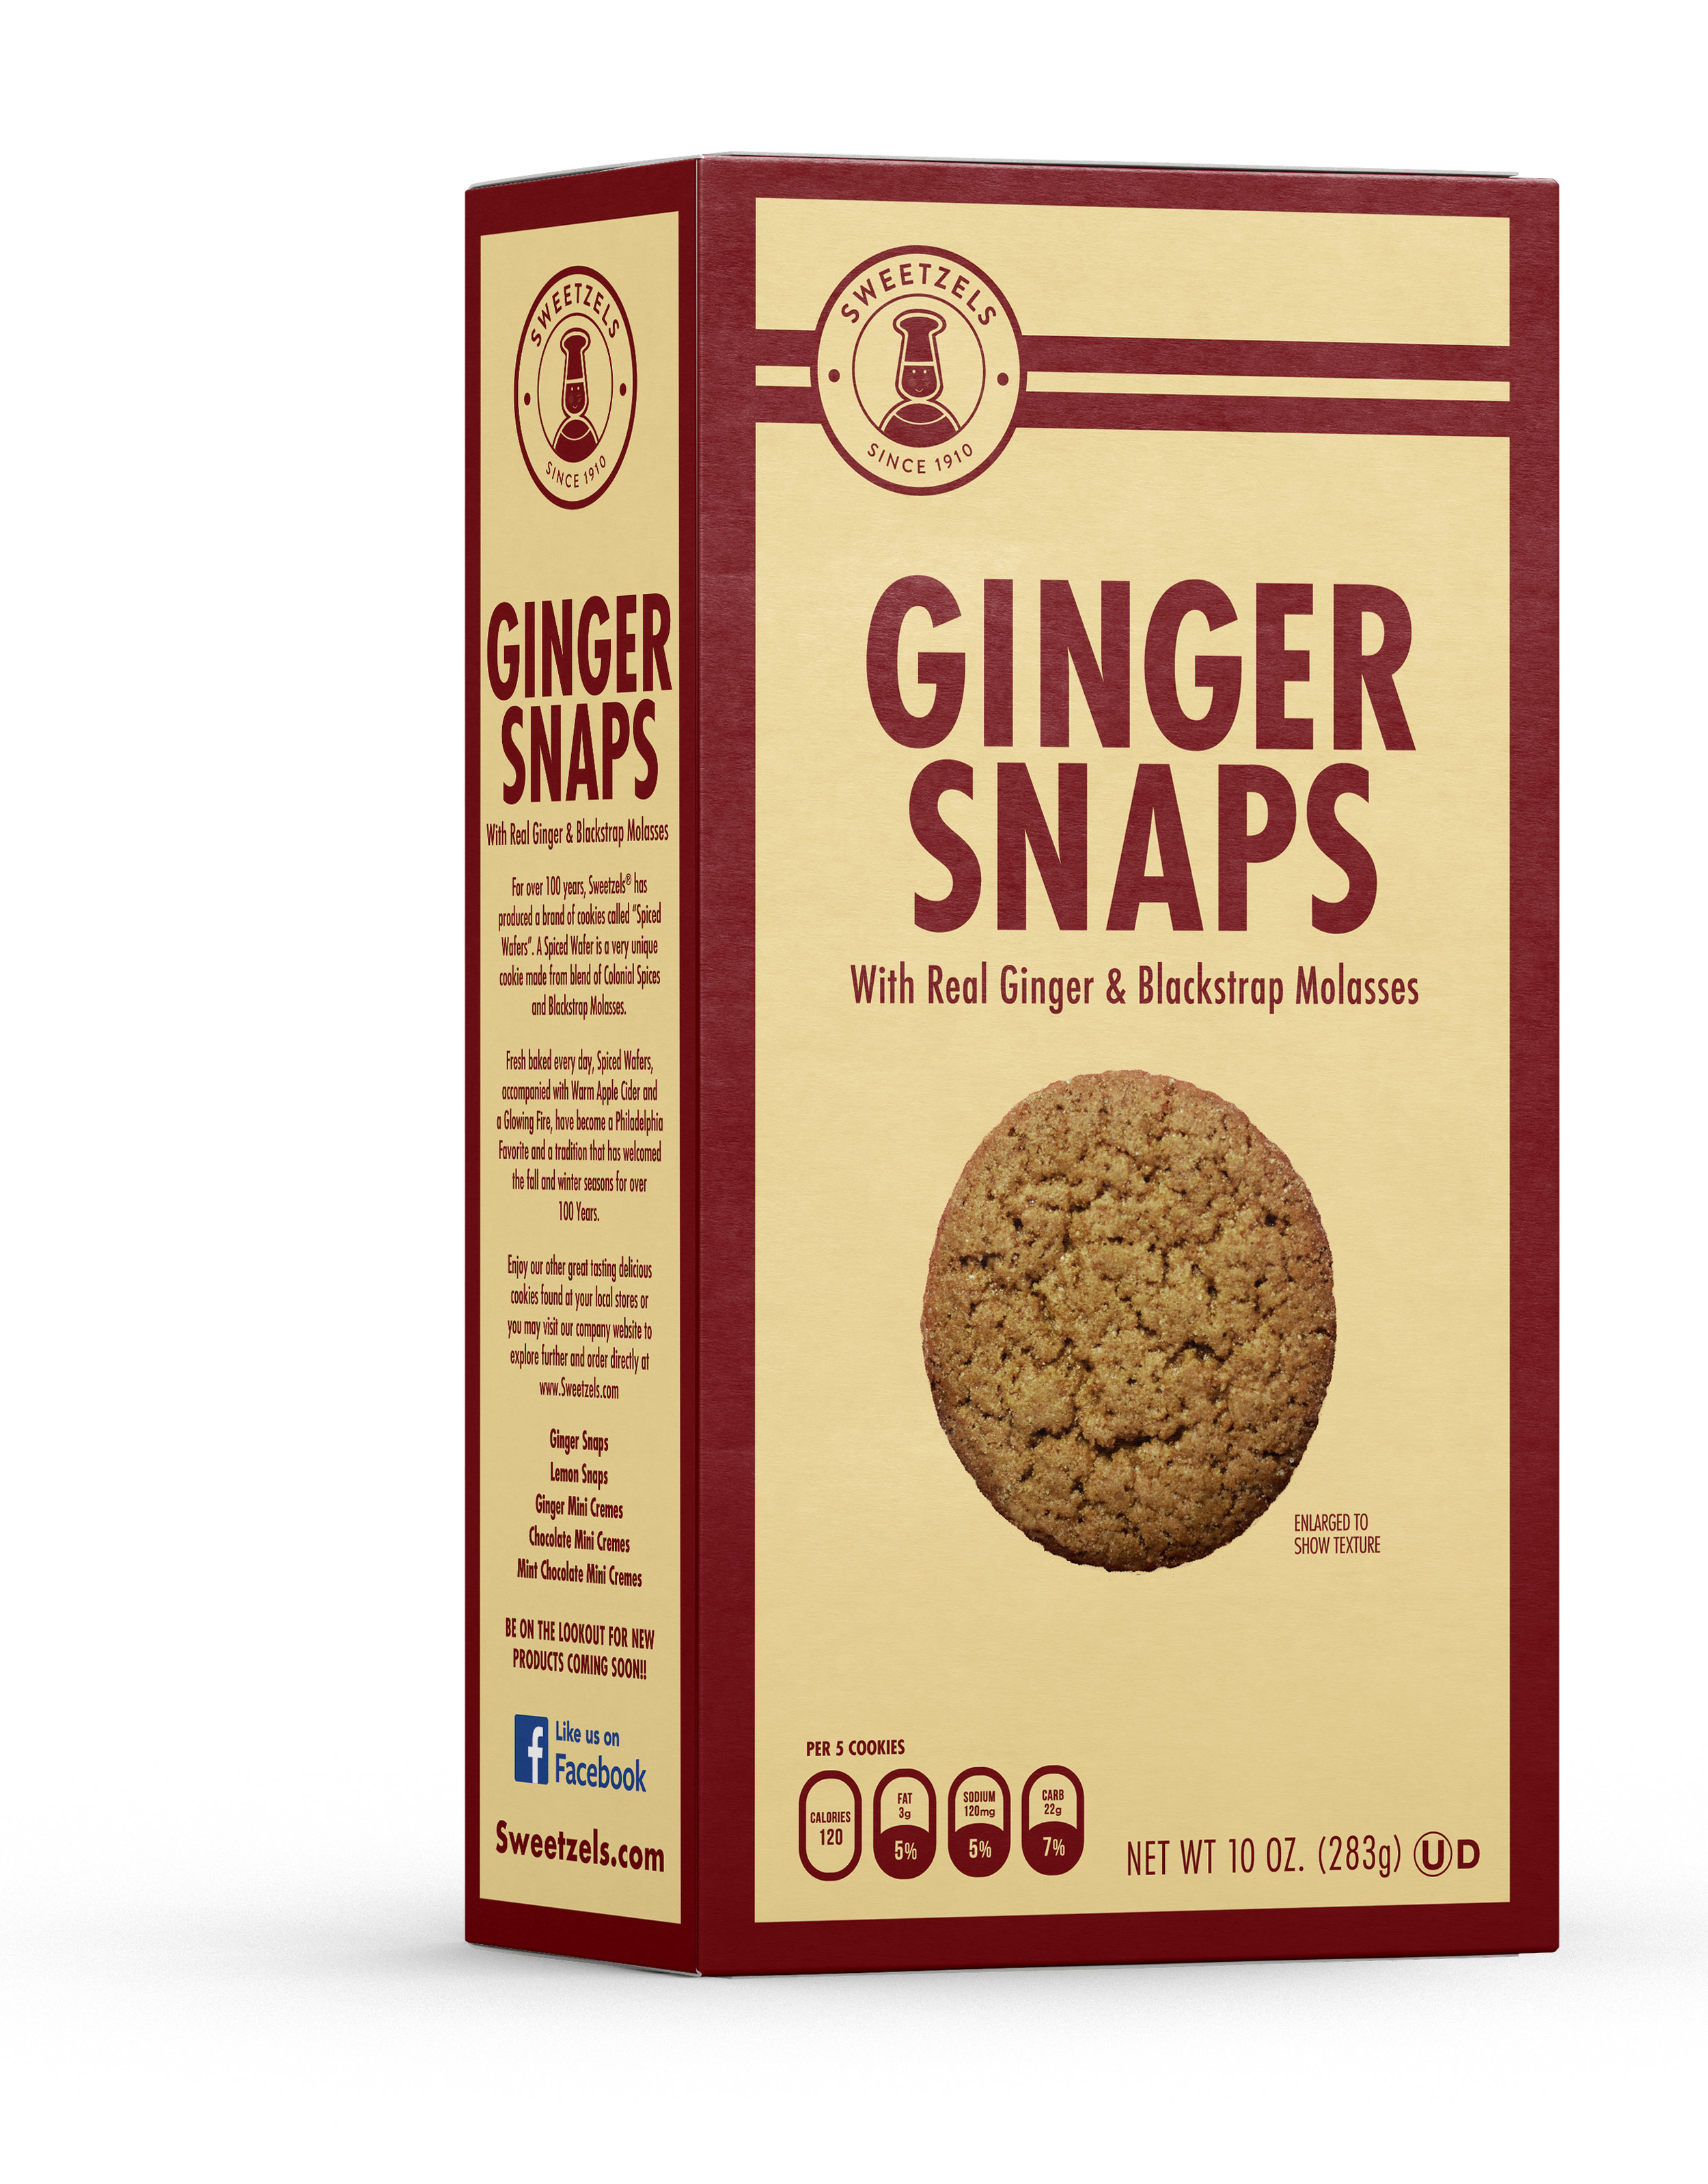 GingerSnap_3-4_SingleBox.jpg